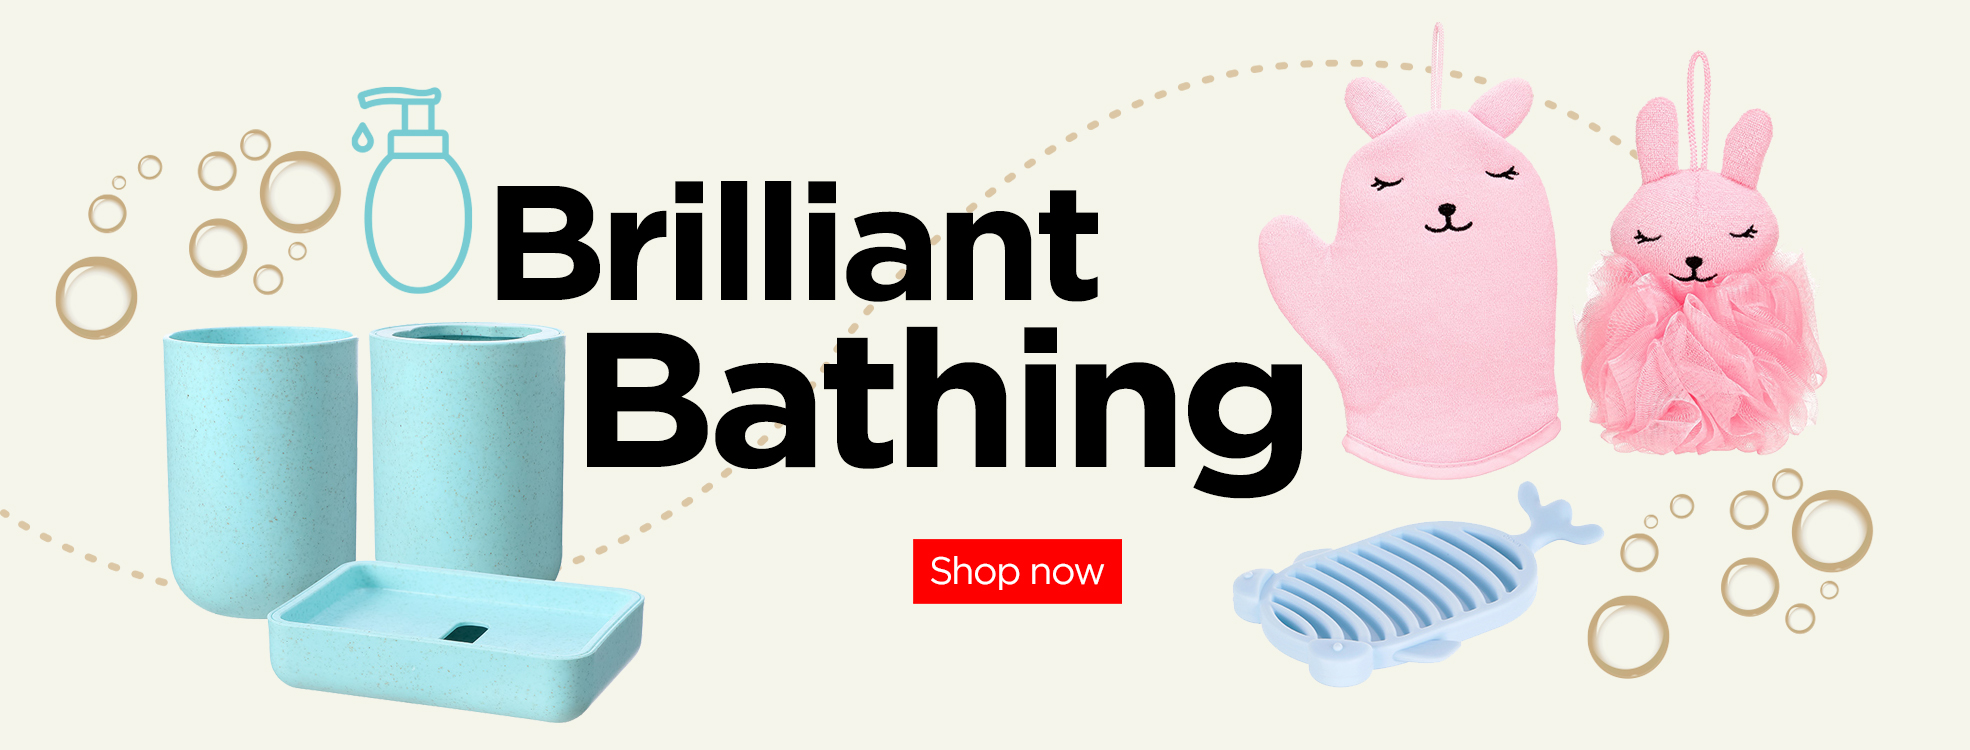 Brilliant Bathing